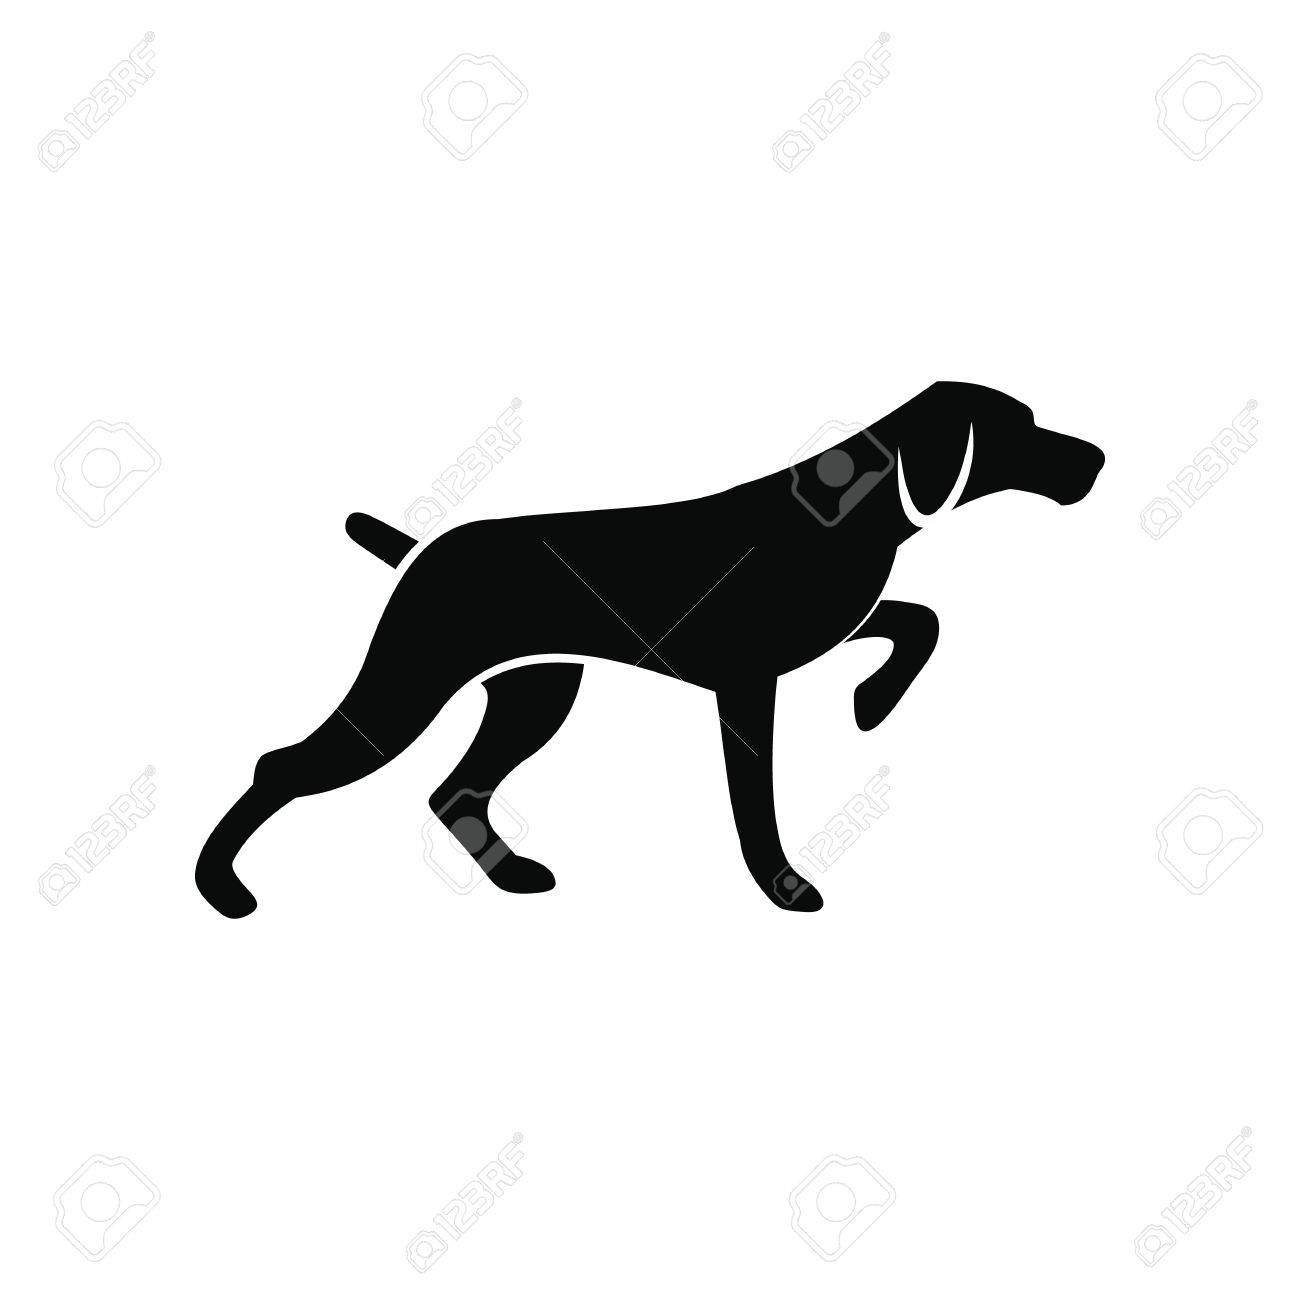 Hunting dog black simple icon isolated on white background - 52015997